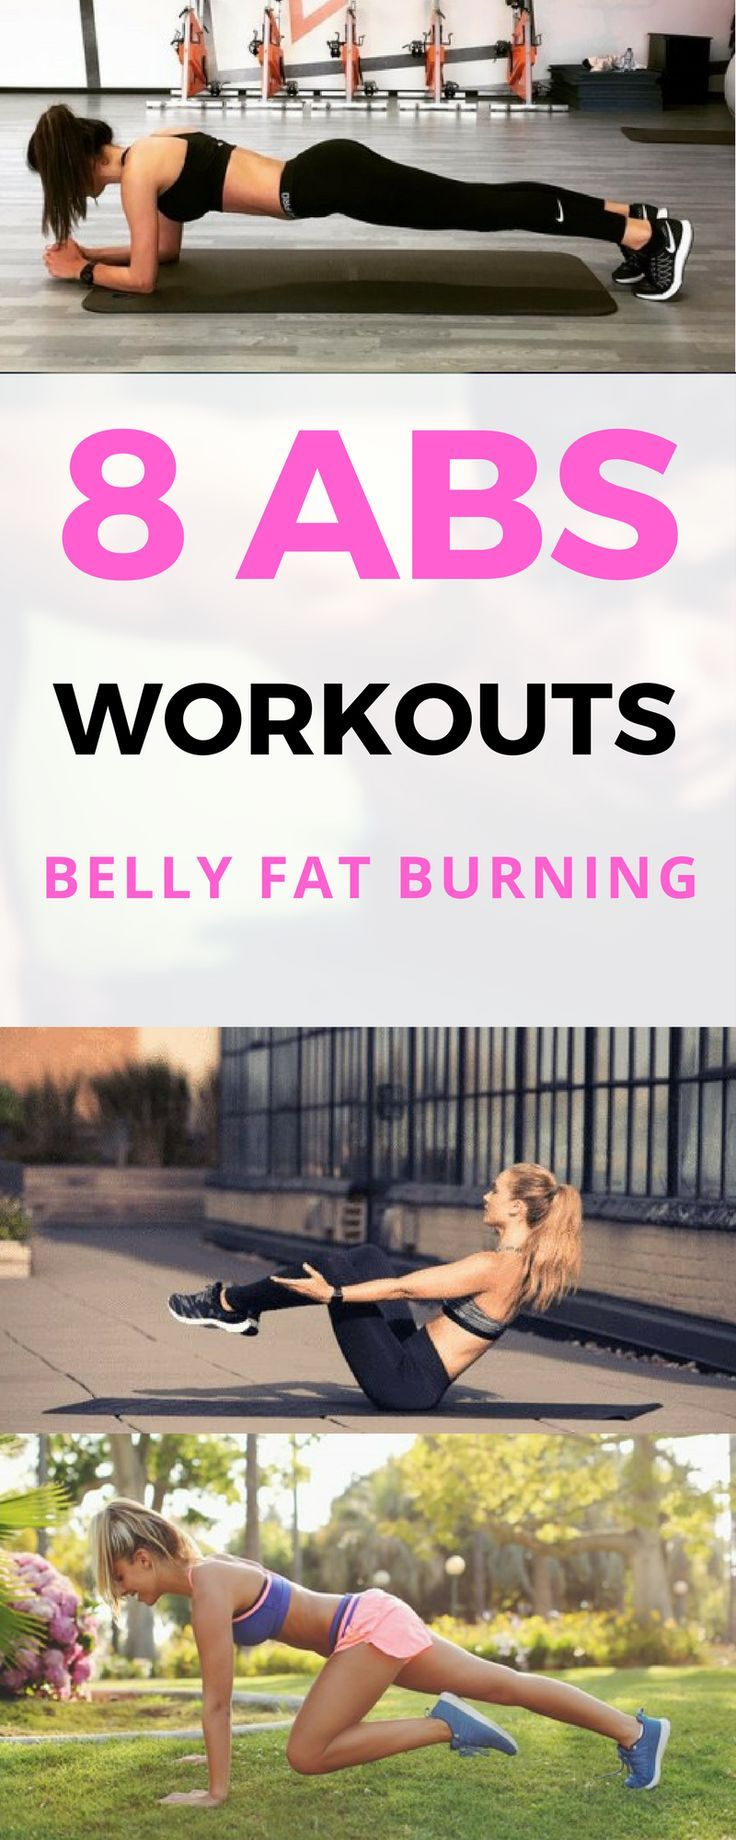 Will cutting carbs burn fat